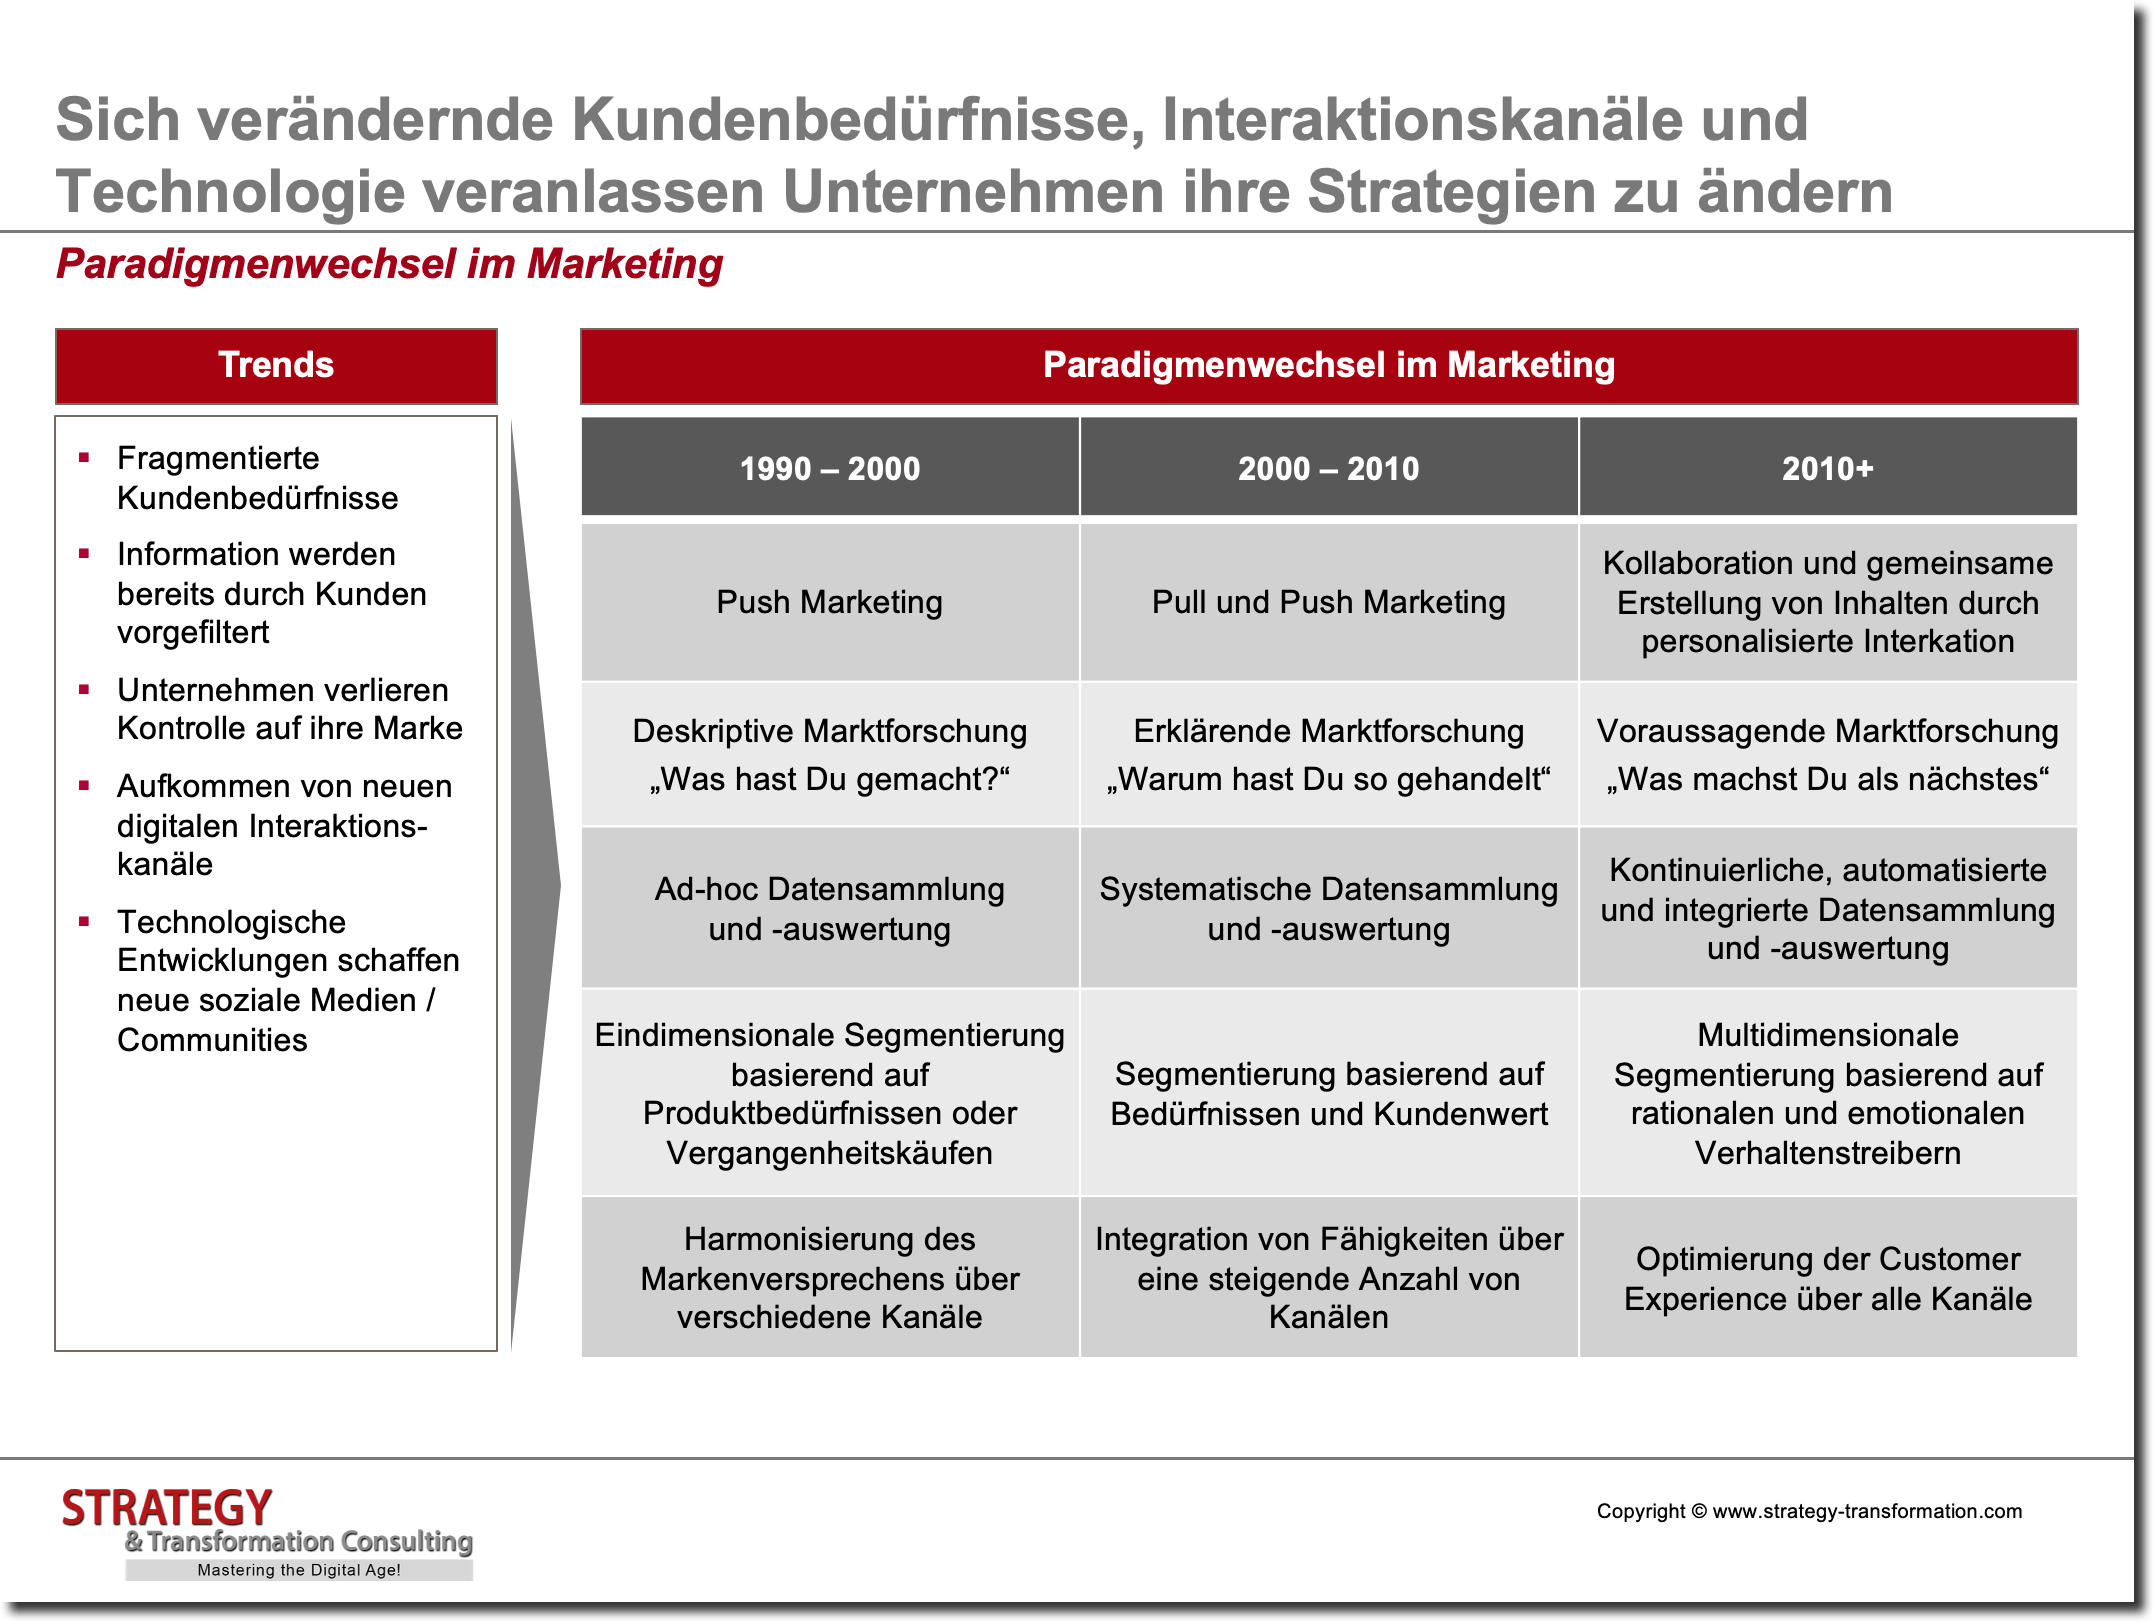 Customer Experience Management_Paradigmenwechsel im Marketing